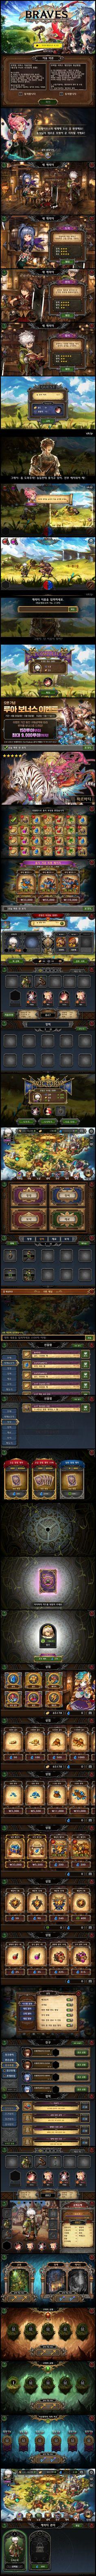 Mobile Game UI